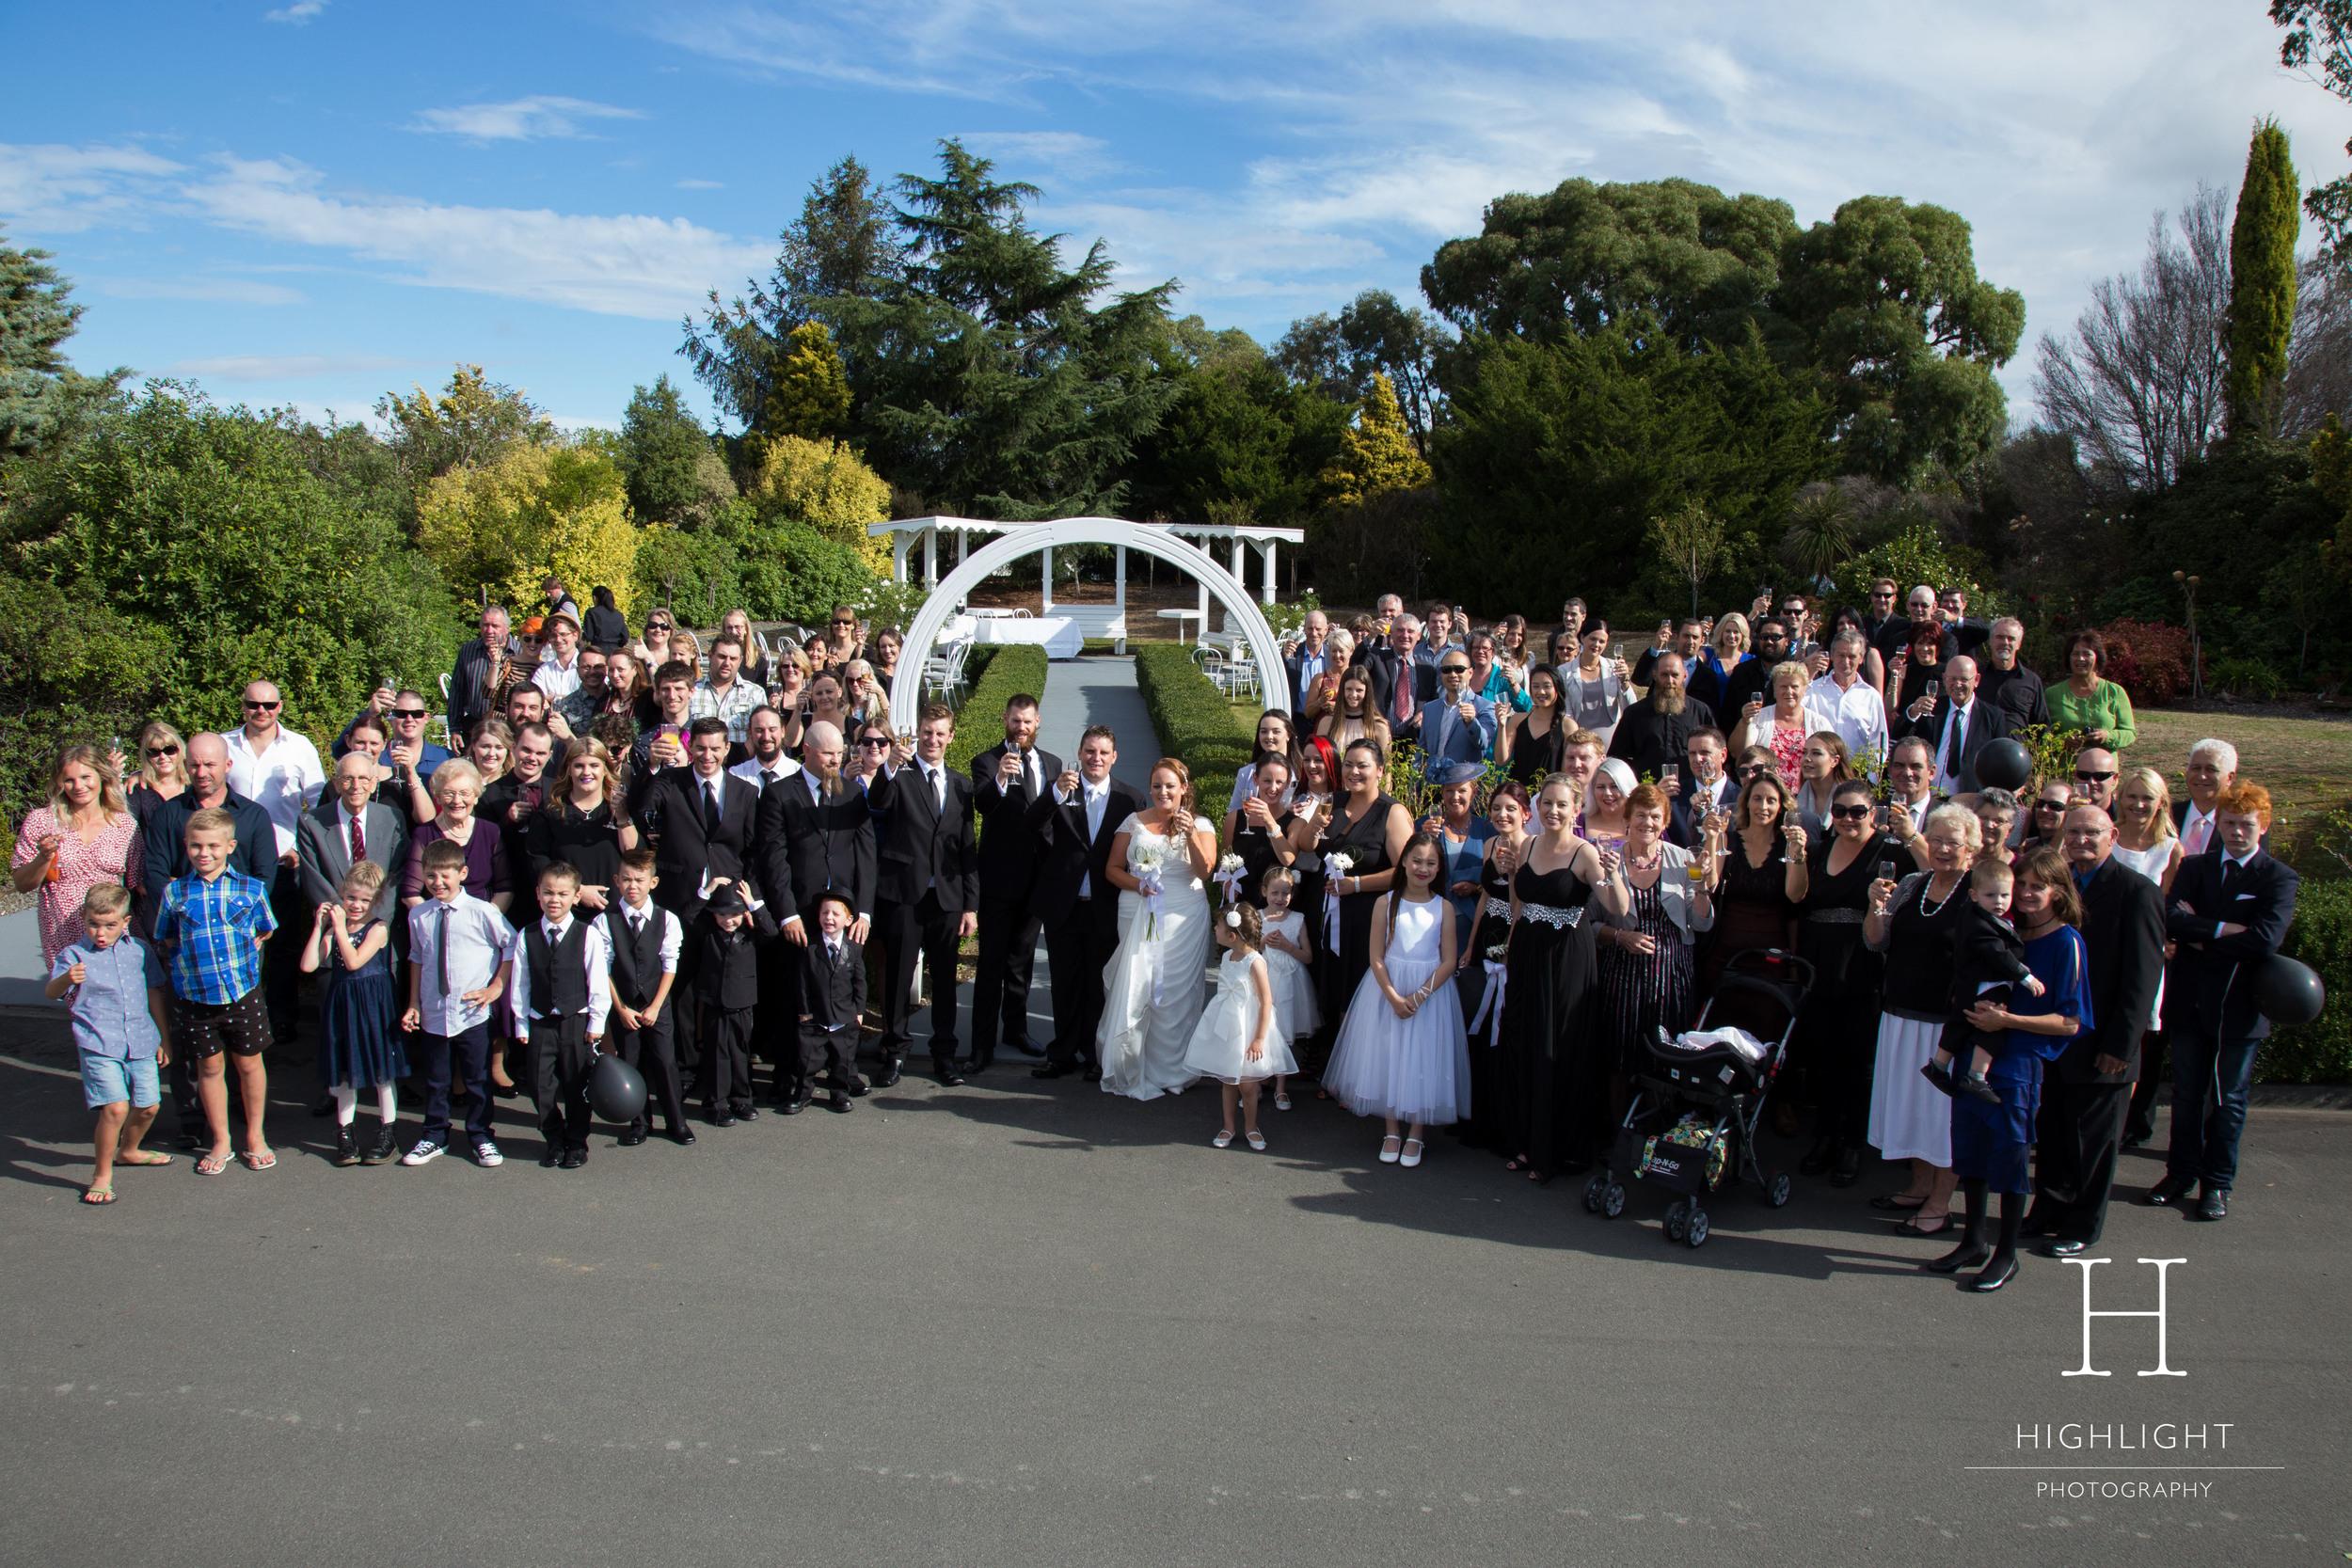 highlight__photography_wedding_new-zealand.jpg